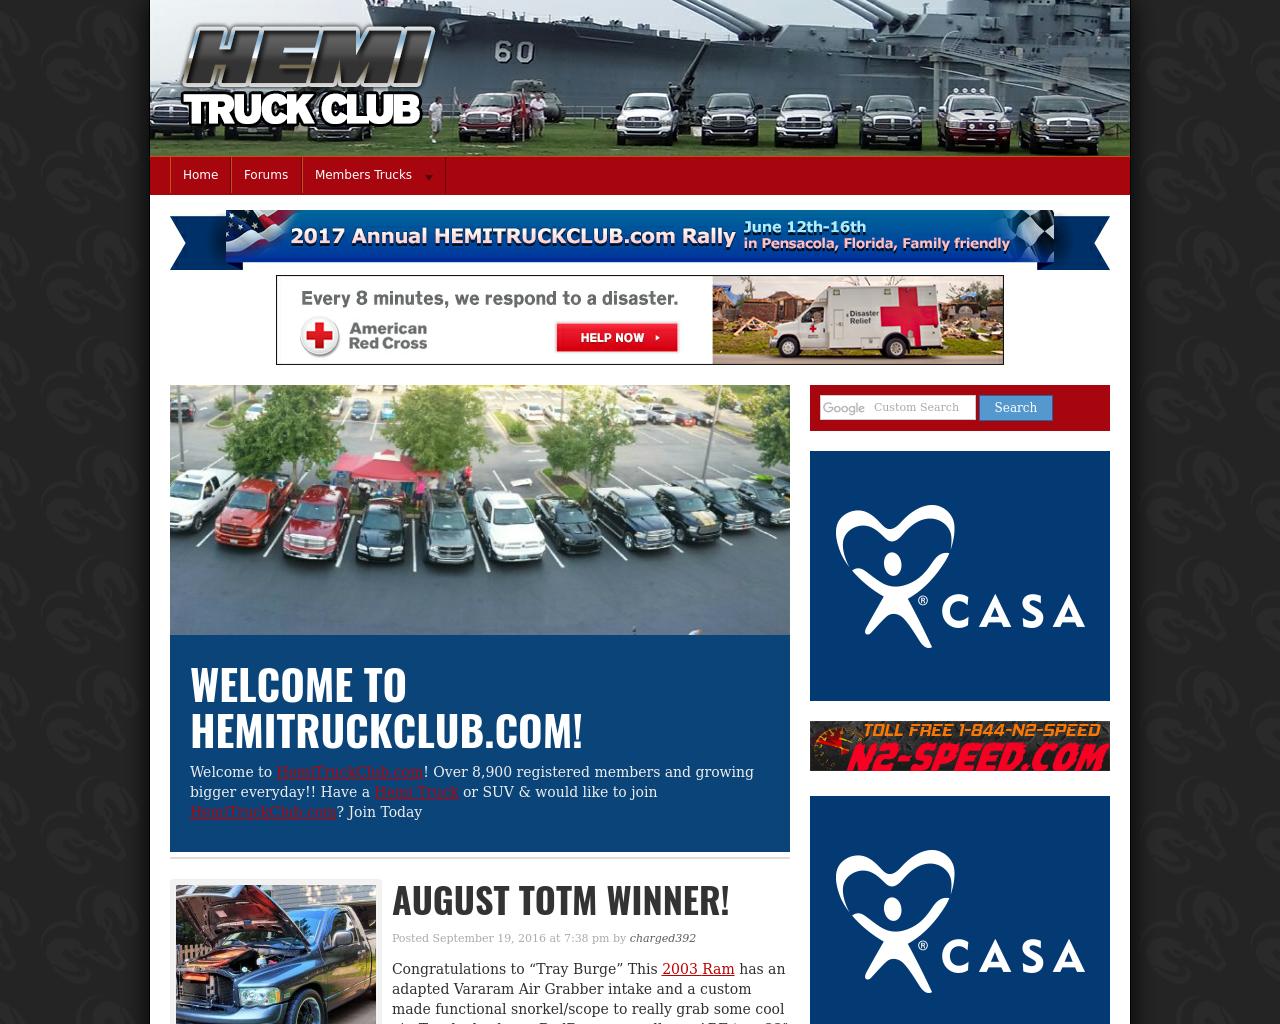 Hemi-Truck-Club-Advertising-Reviews-Pricing